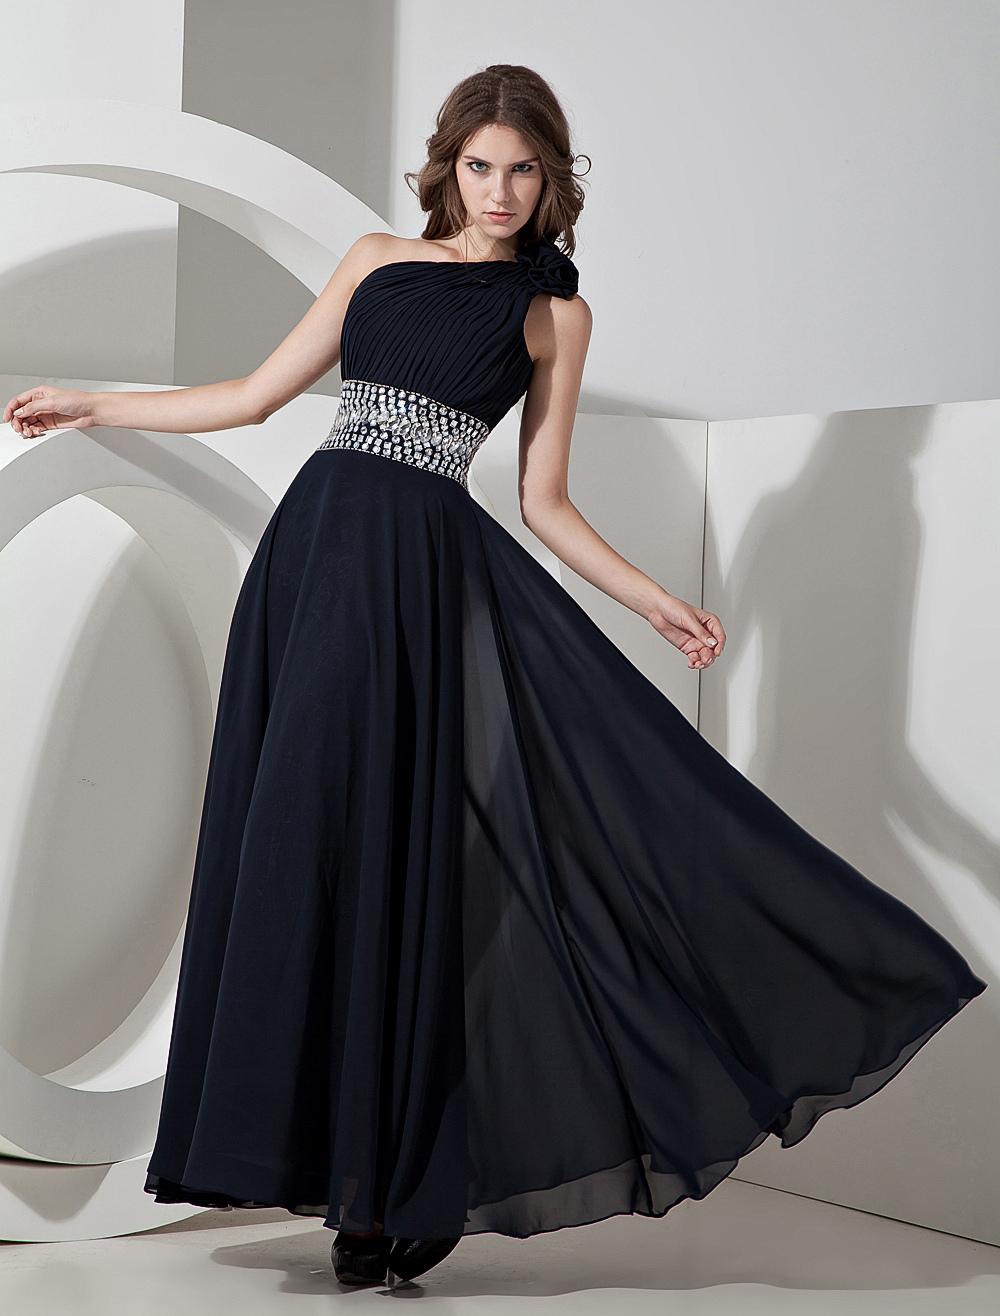 Dark Navy Blue Chiffon One Shoulder Prom Dress Wedding Guest Dress